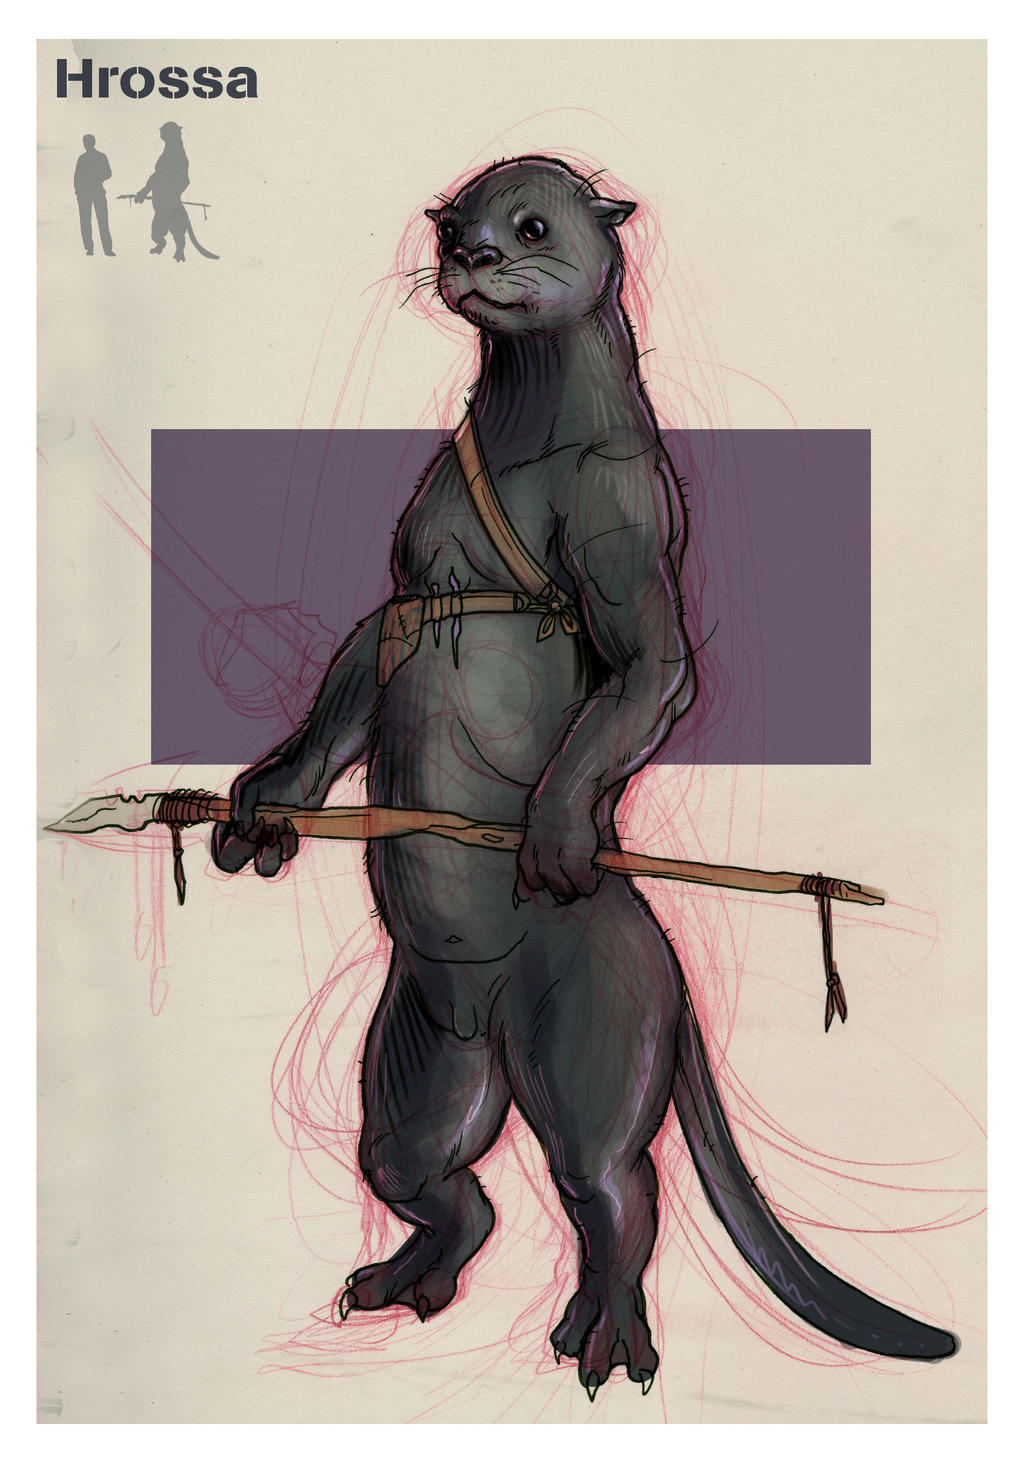 The Species of Malacandra: The Hrossa by Deimos-Remus